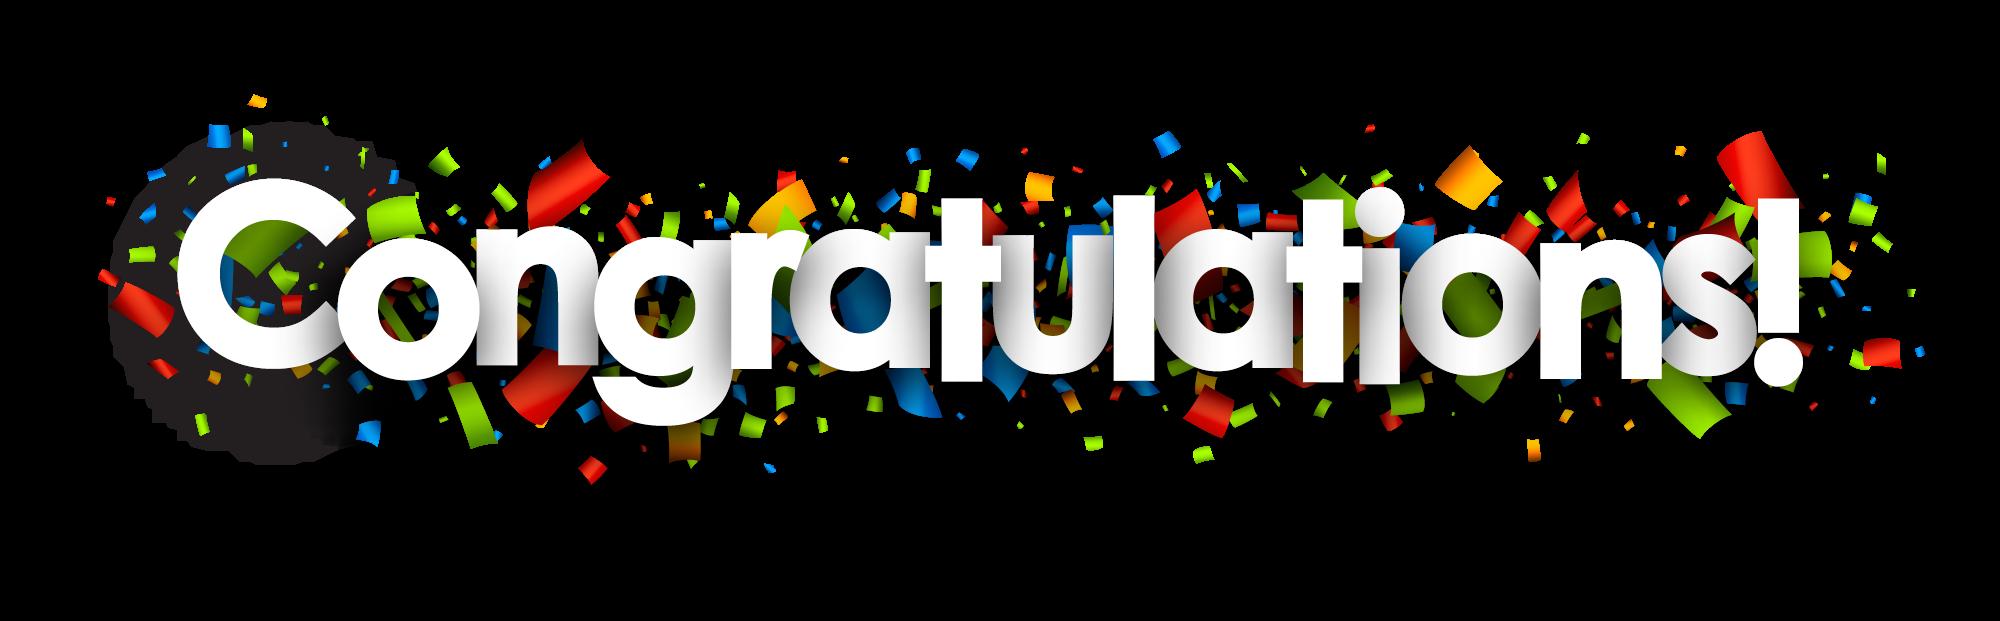 Competition clipart congratulation. United states prize award